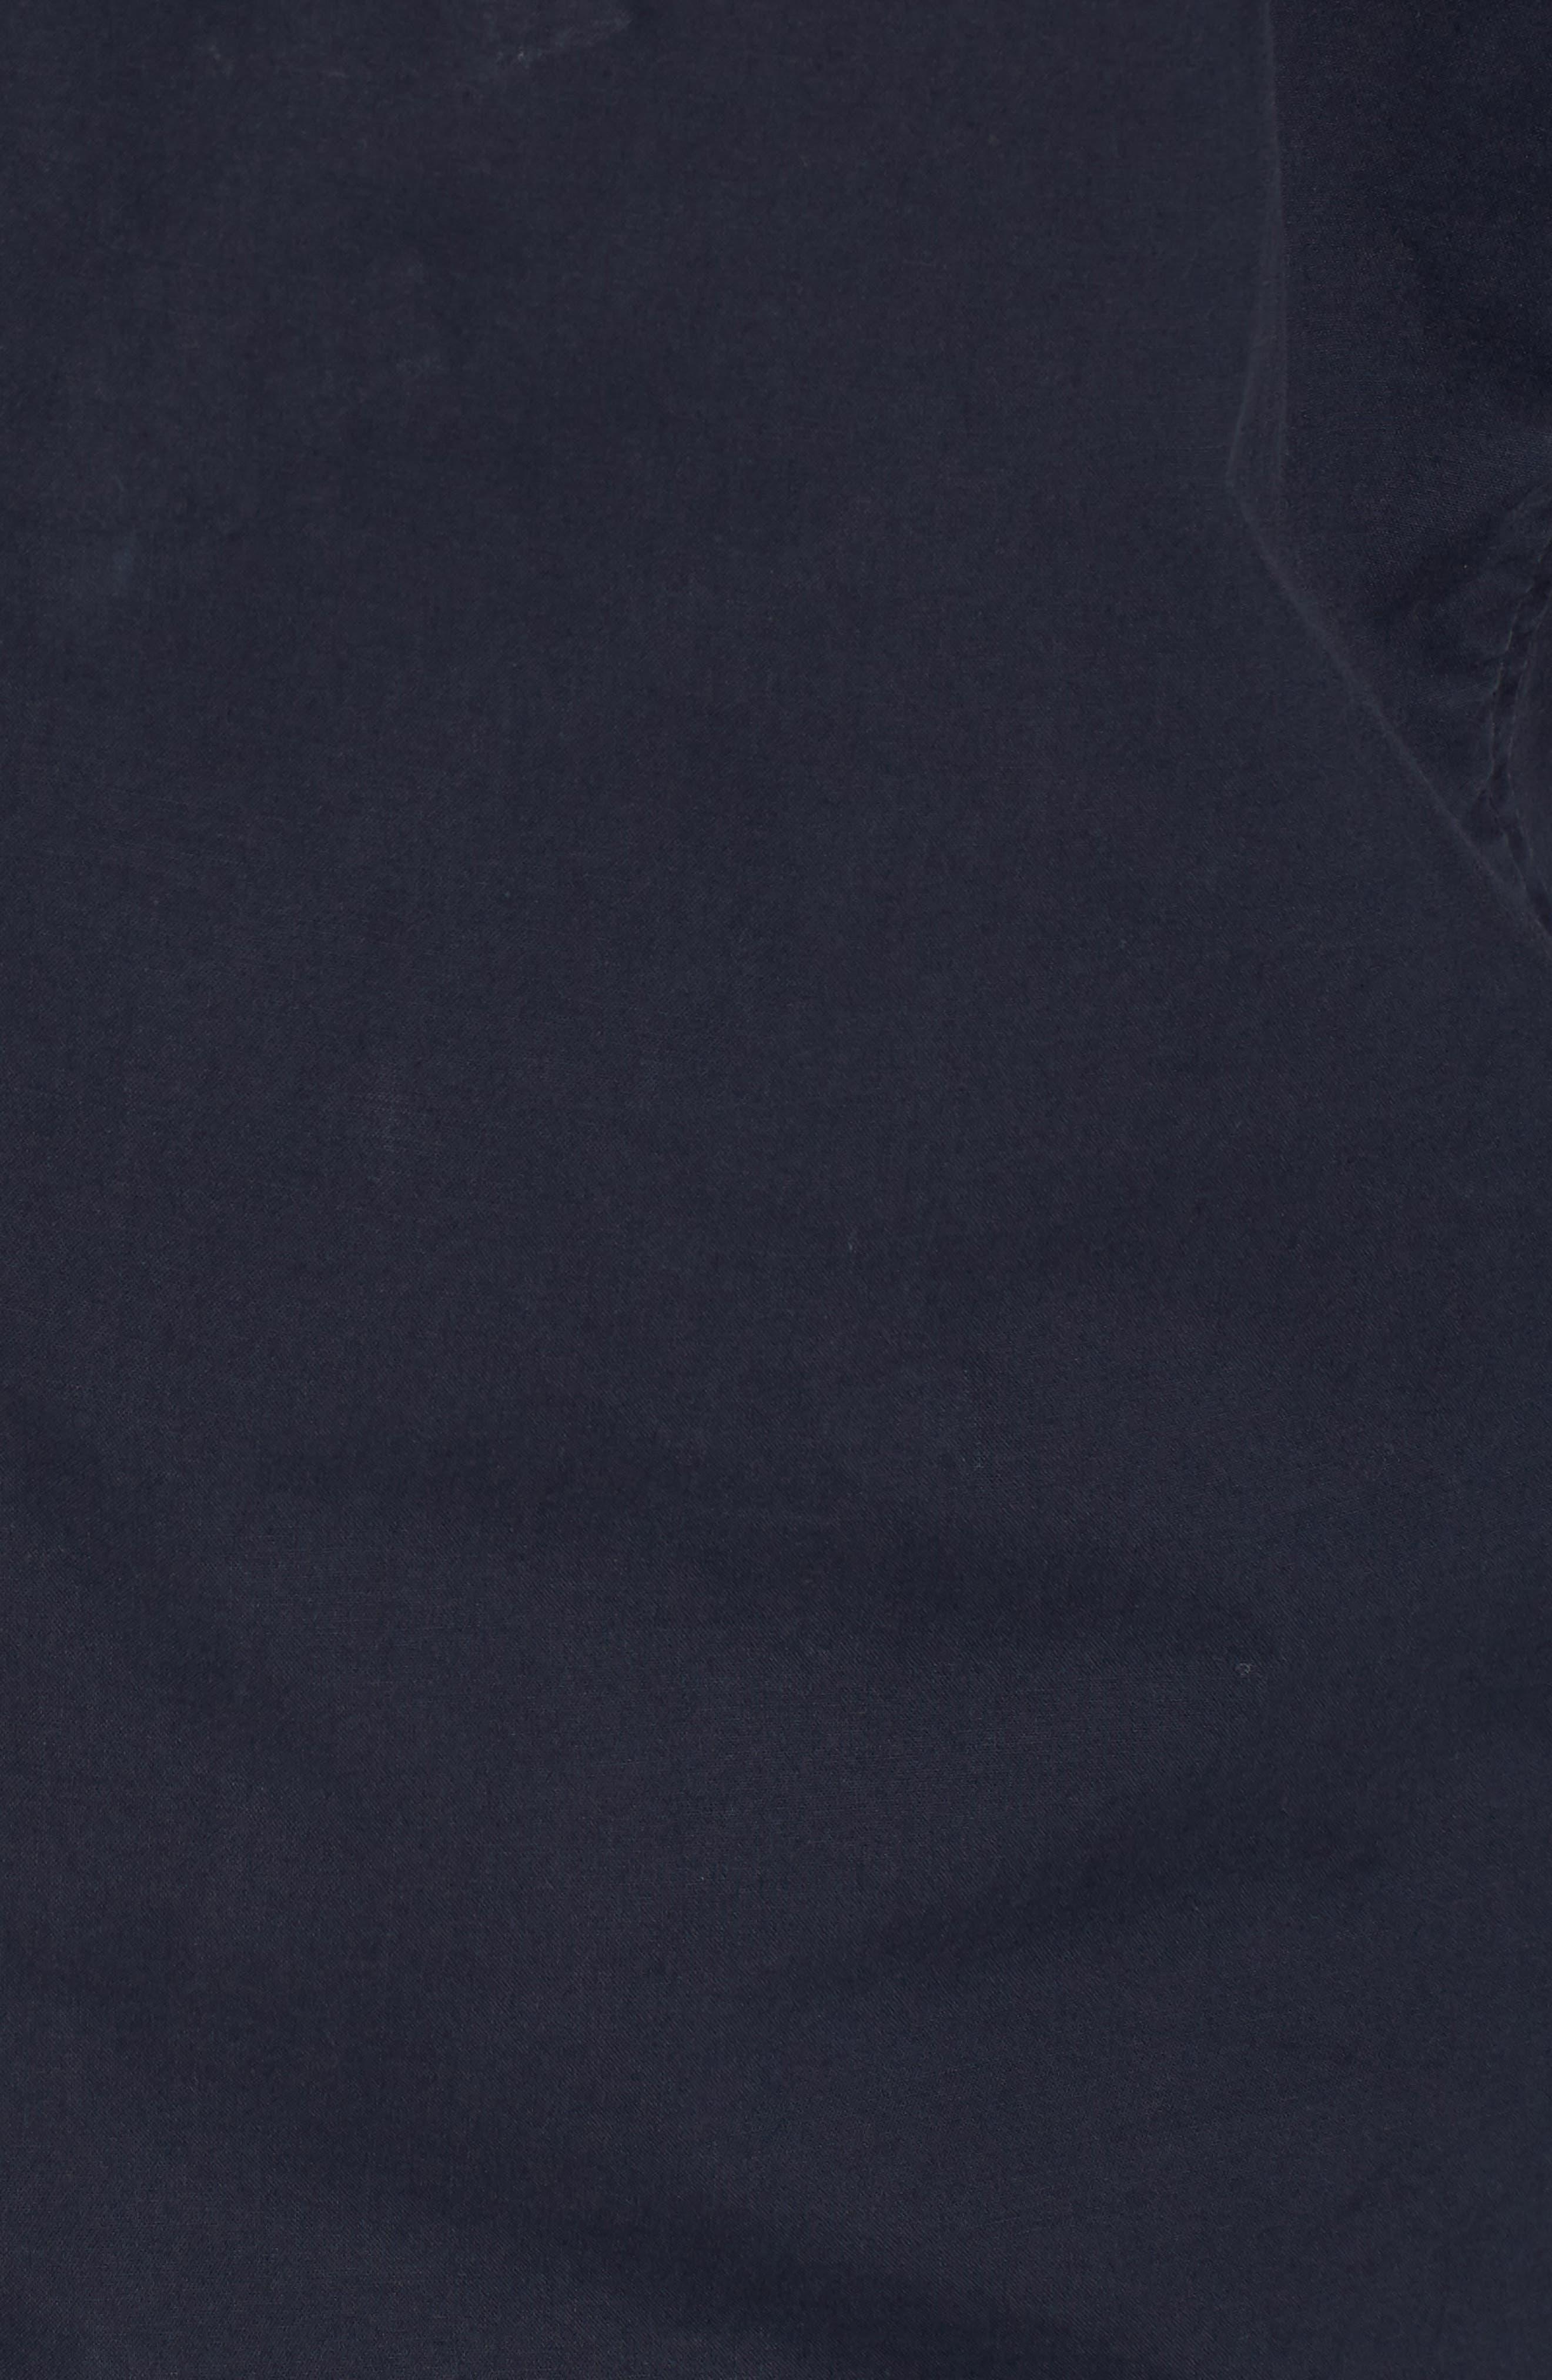 Shane Regular Fit Stretch Cotton Blazer,                             Alternate thumbnail 5, color,                             Sulfur Dark Cove